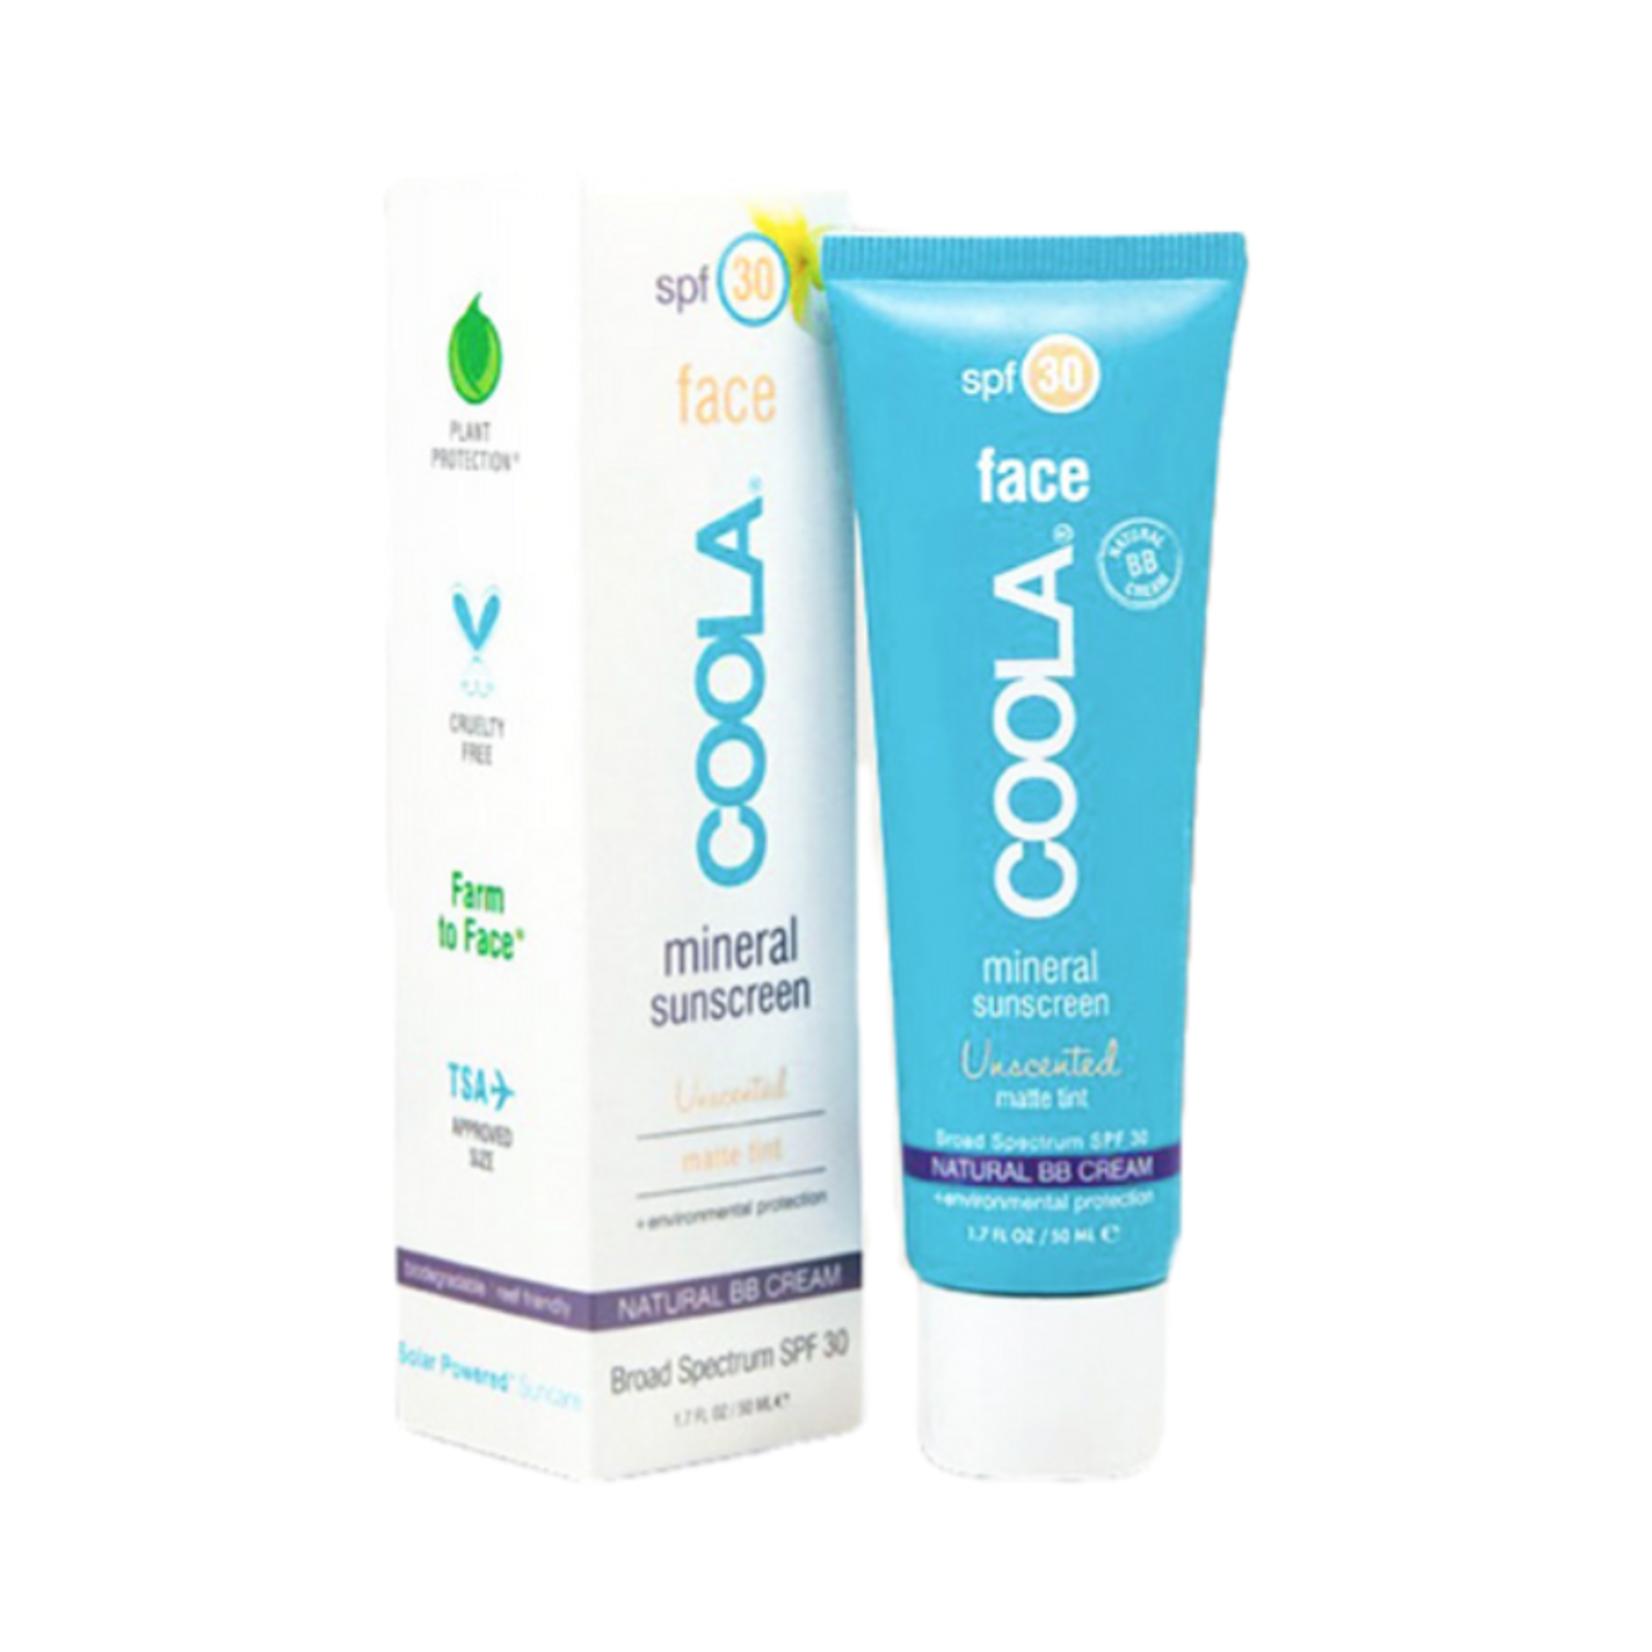 Coola Écran solaire inodore SPF 30 (visage)